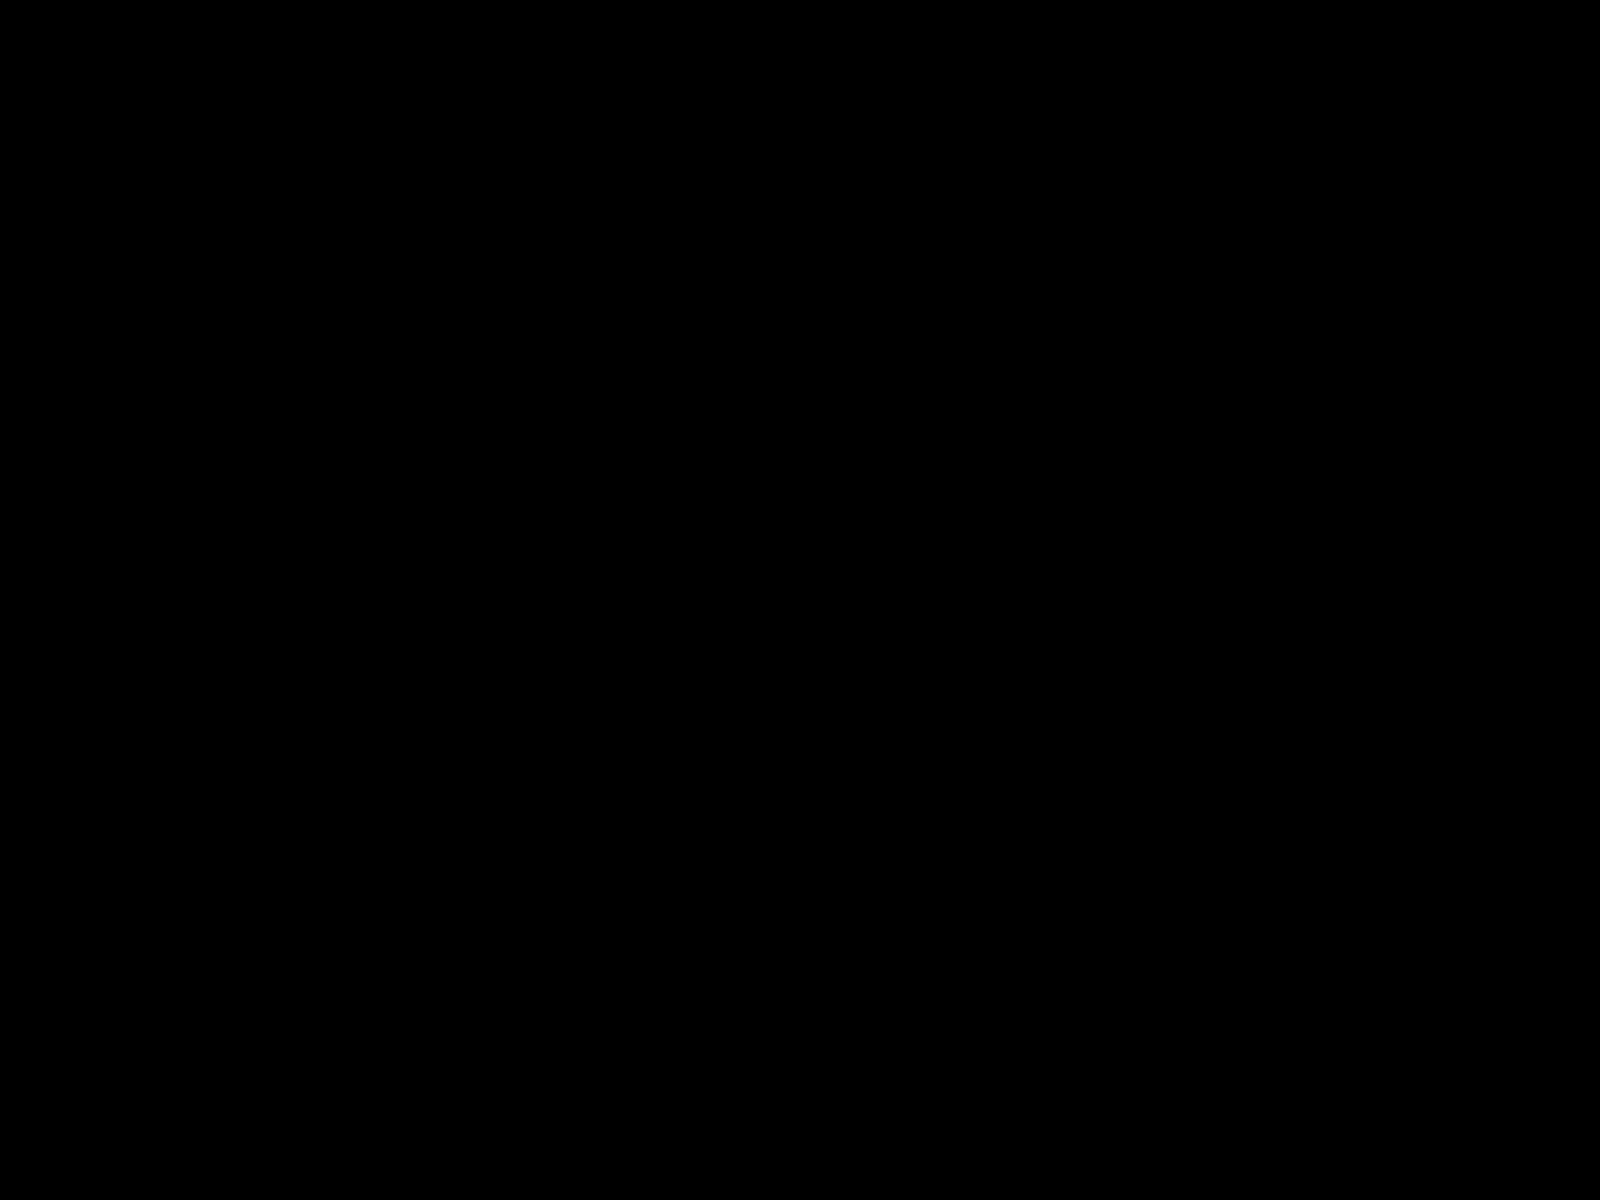 Technology-digital-dot-pattern-Abstract-background-000070071359_Medium2-1